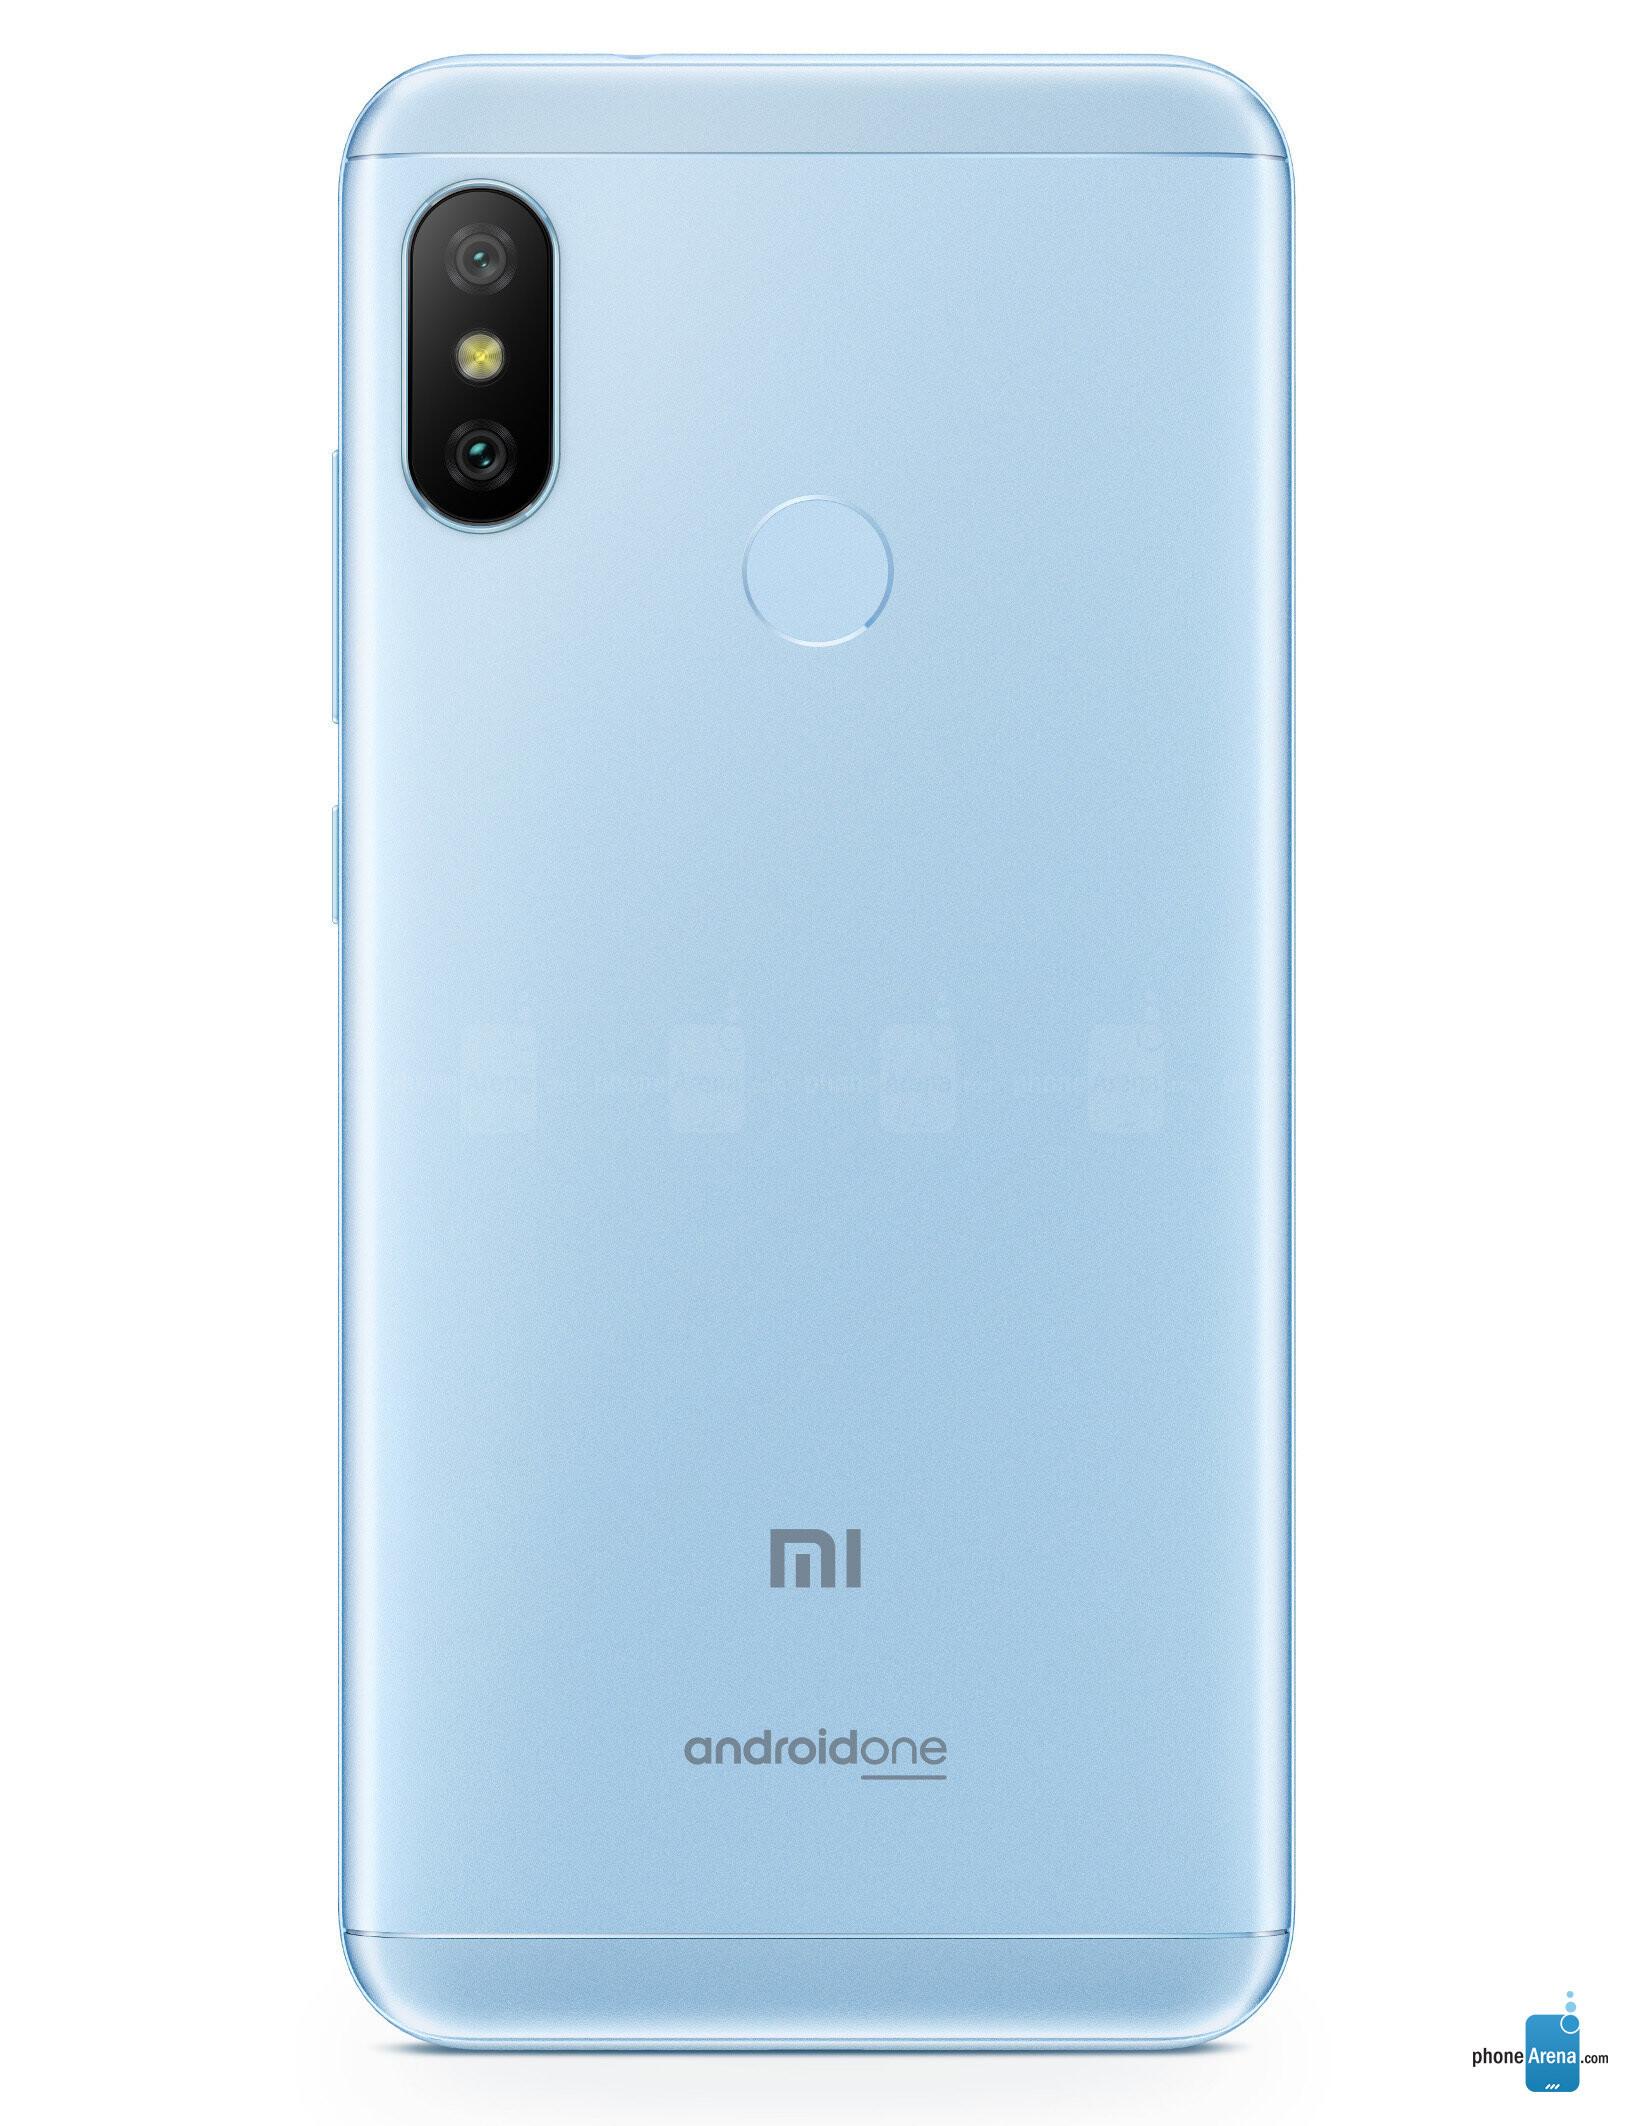 Xiaomi 2 phone analysis